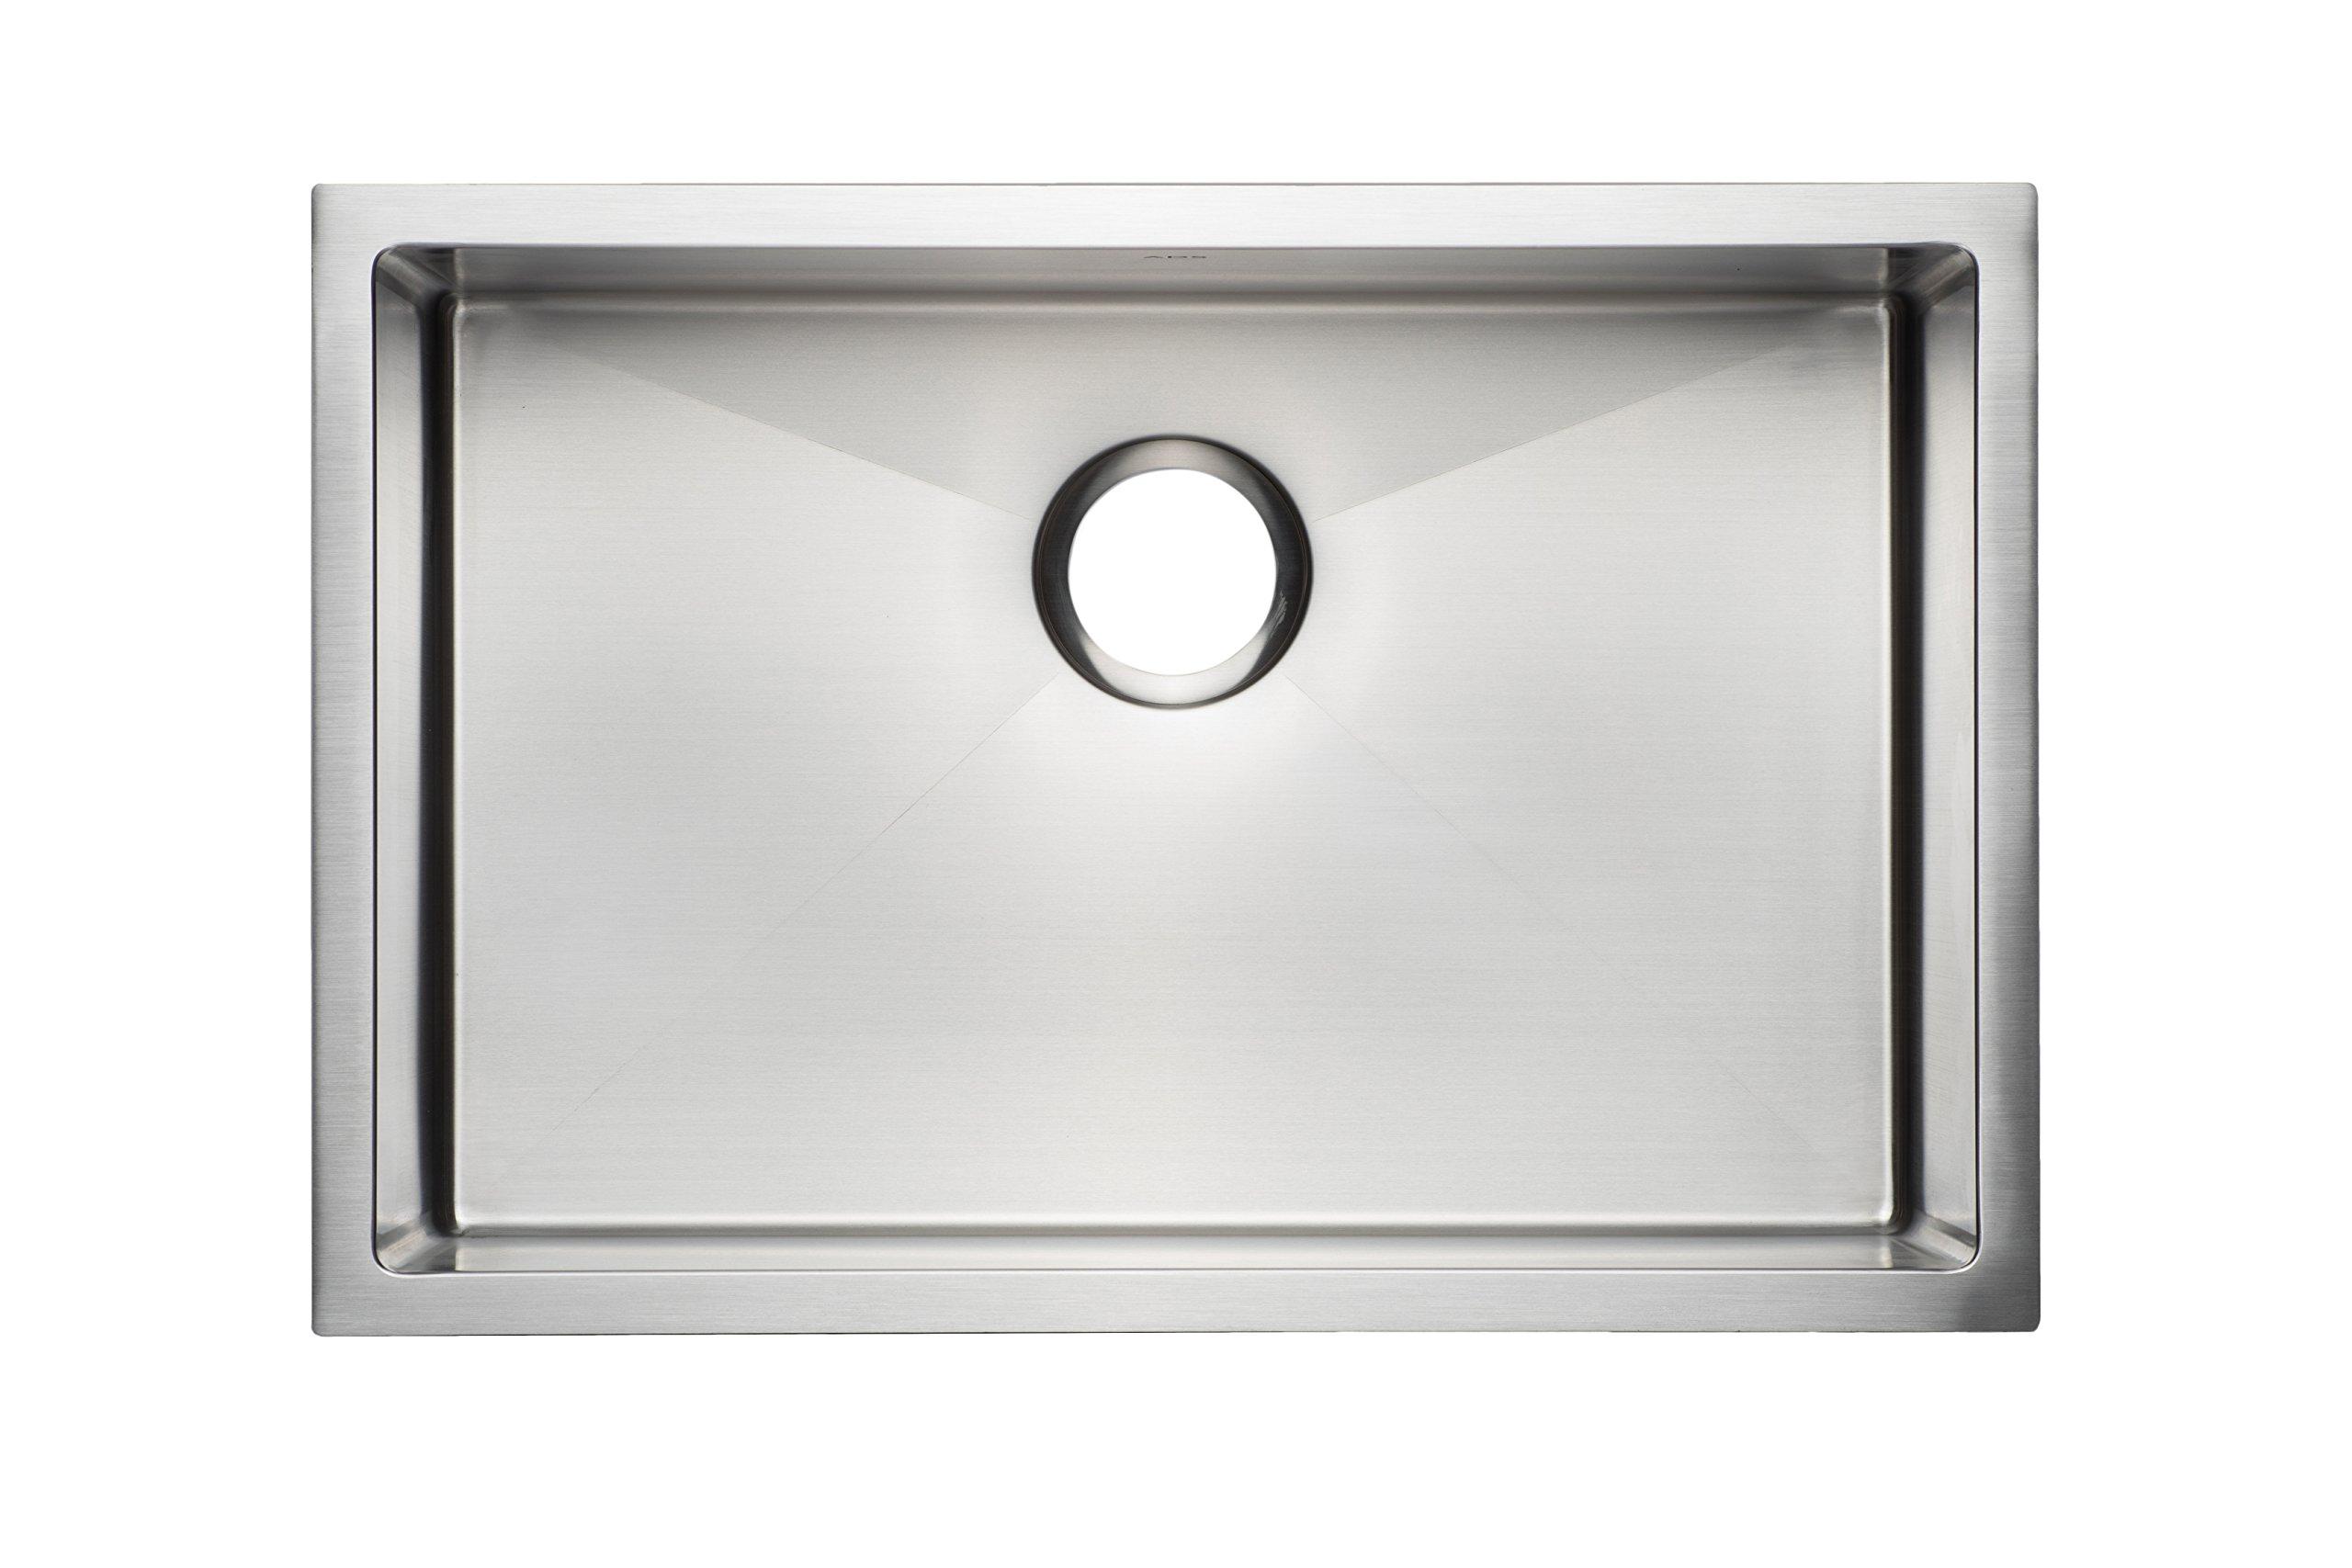 27'' Premium Quality Handmade Stainless Steel Kitchen Sink Single Bowl / Undermount 16 Gauge (30'' cabinet) by ADS